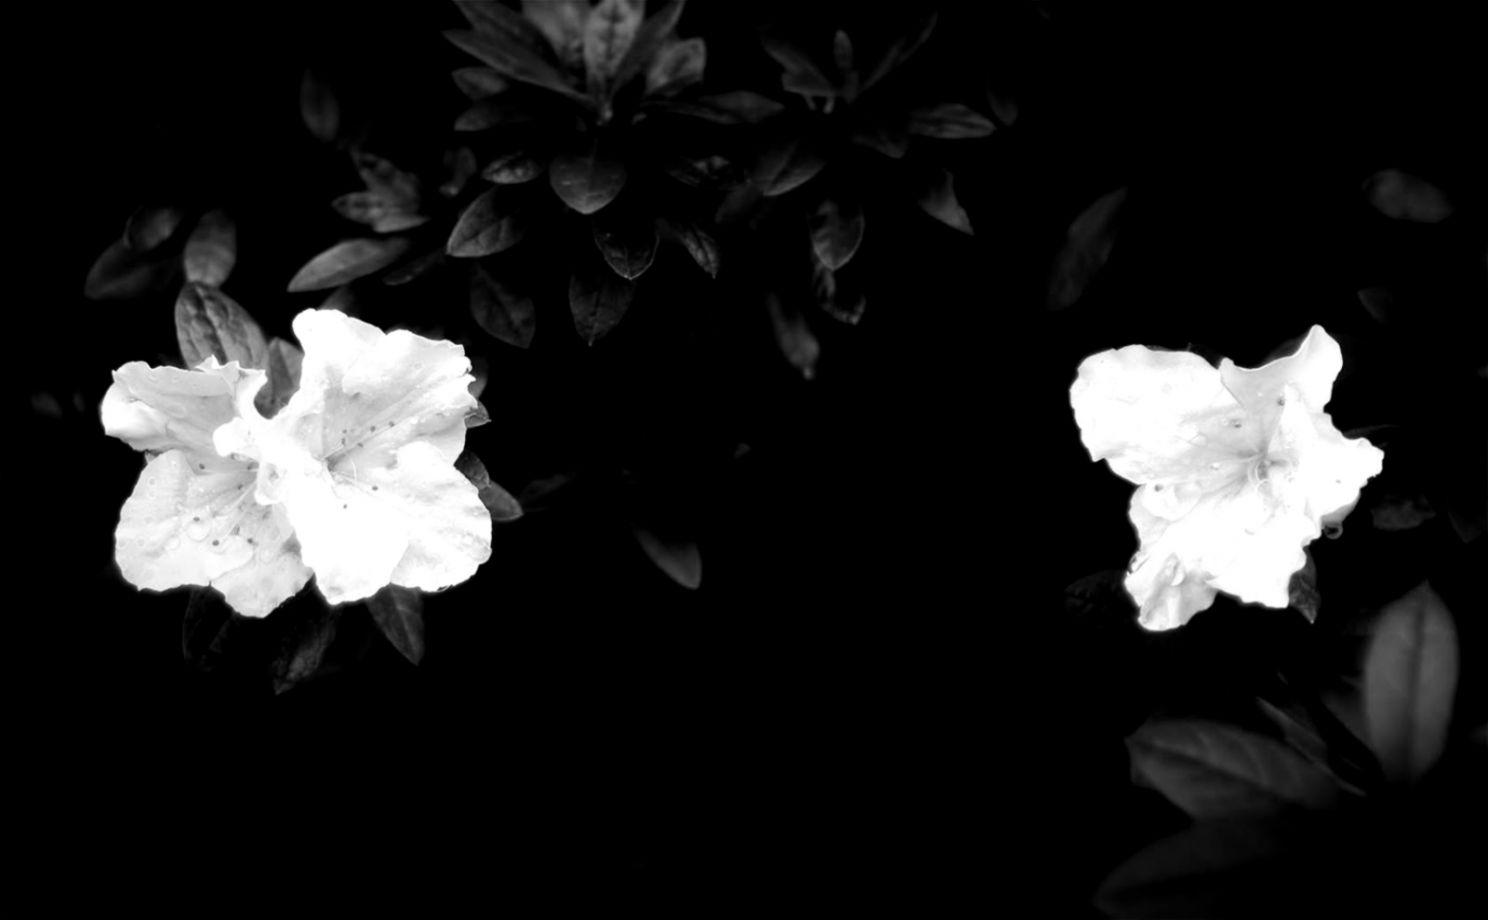 Flowers Black Background 6989700